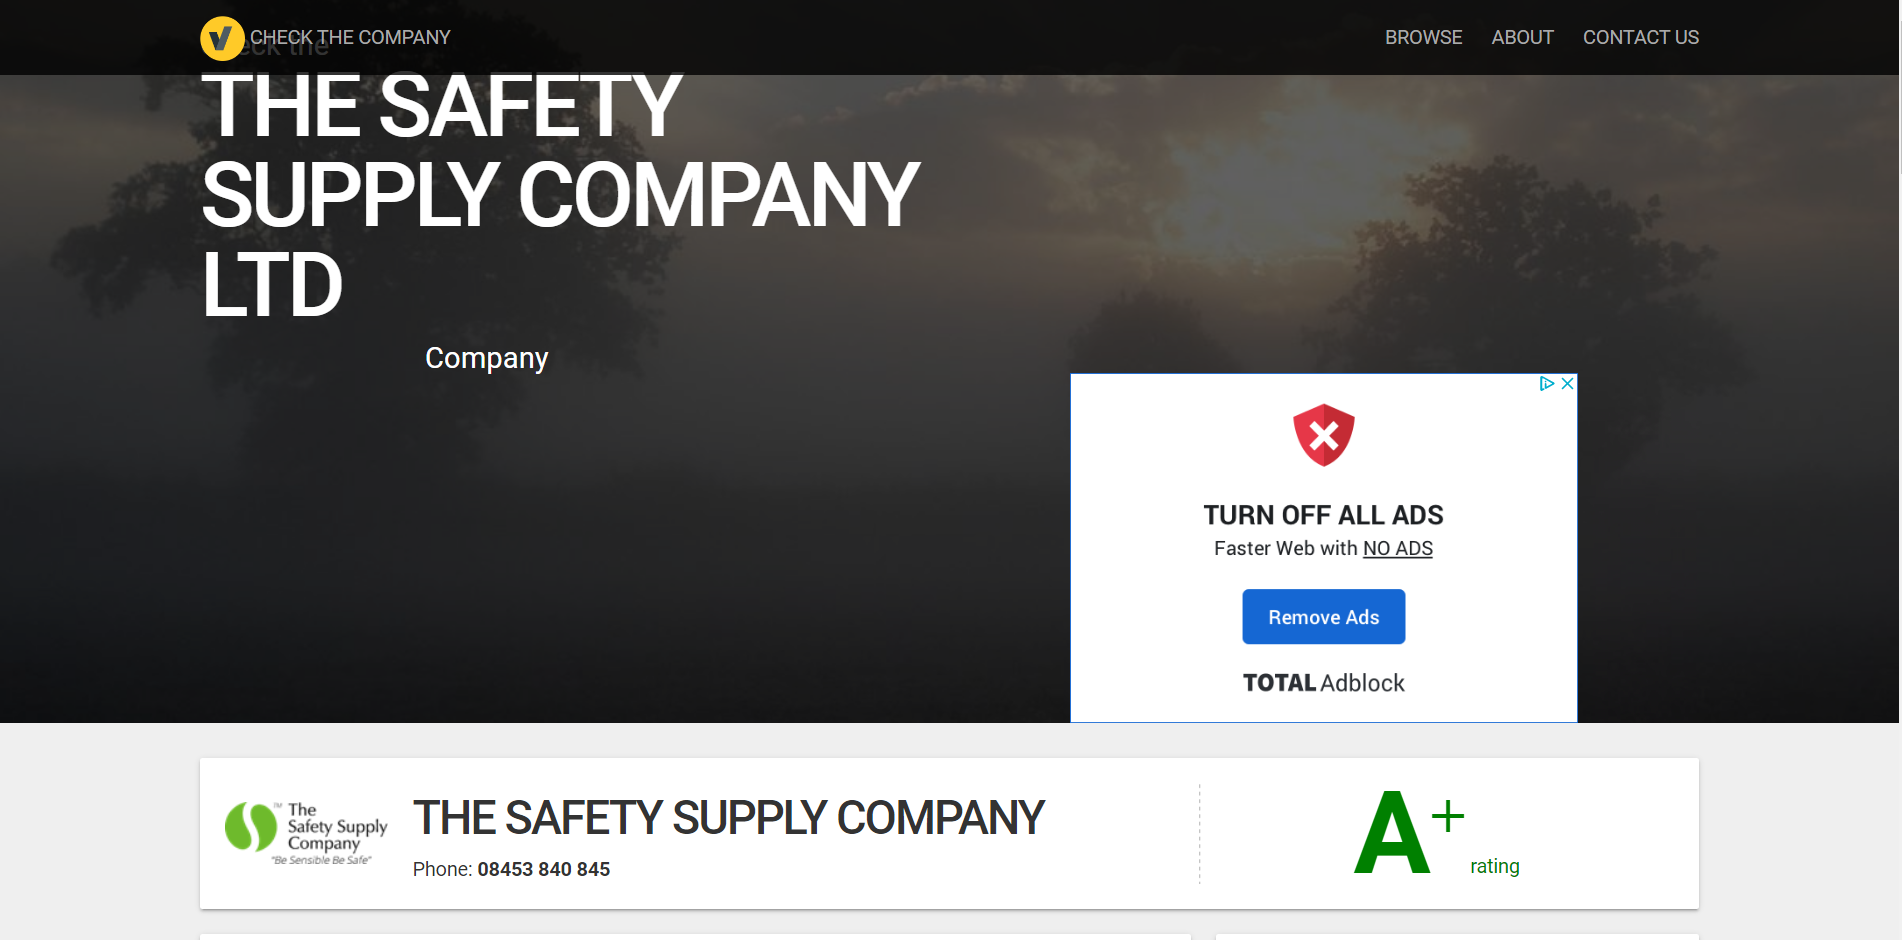 Check the company